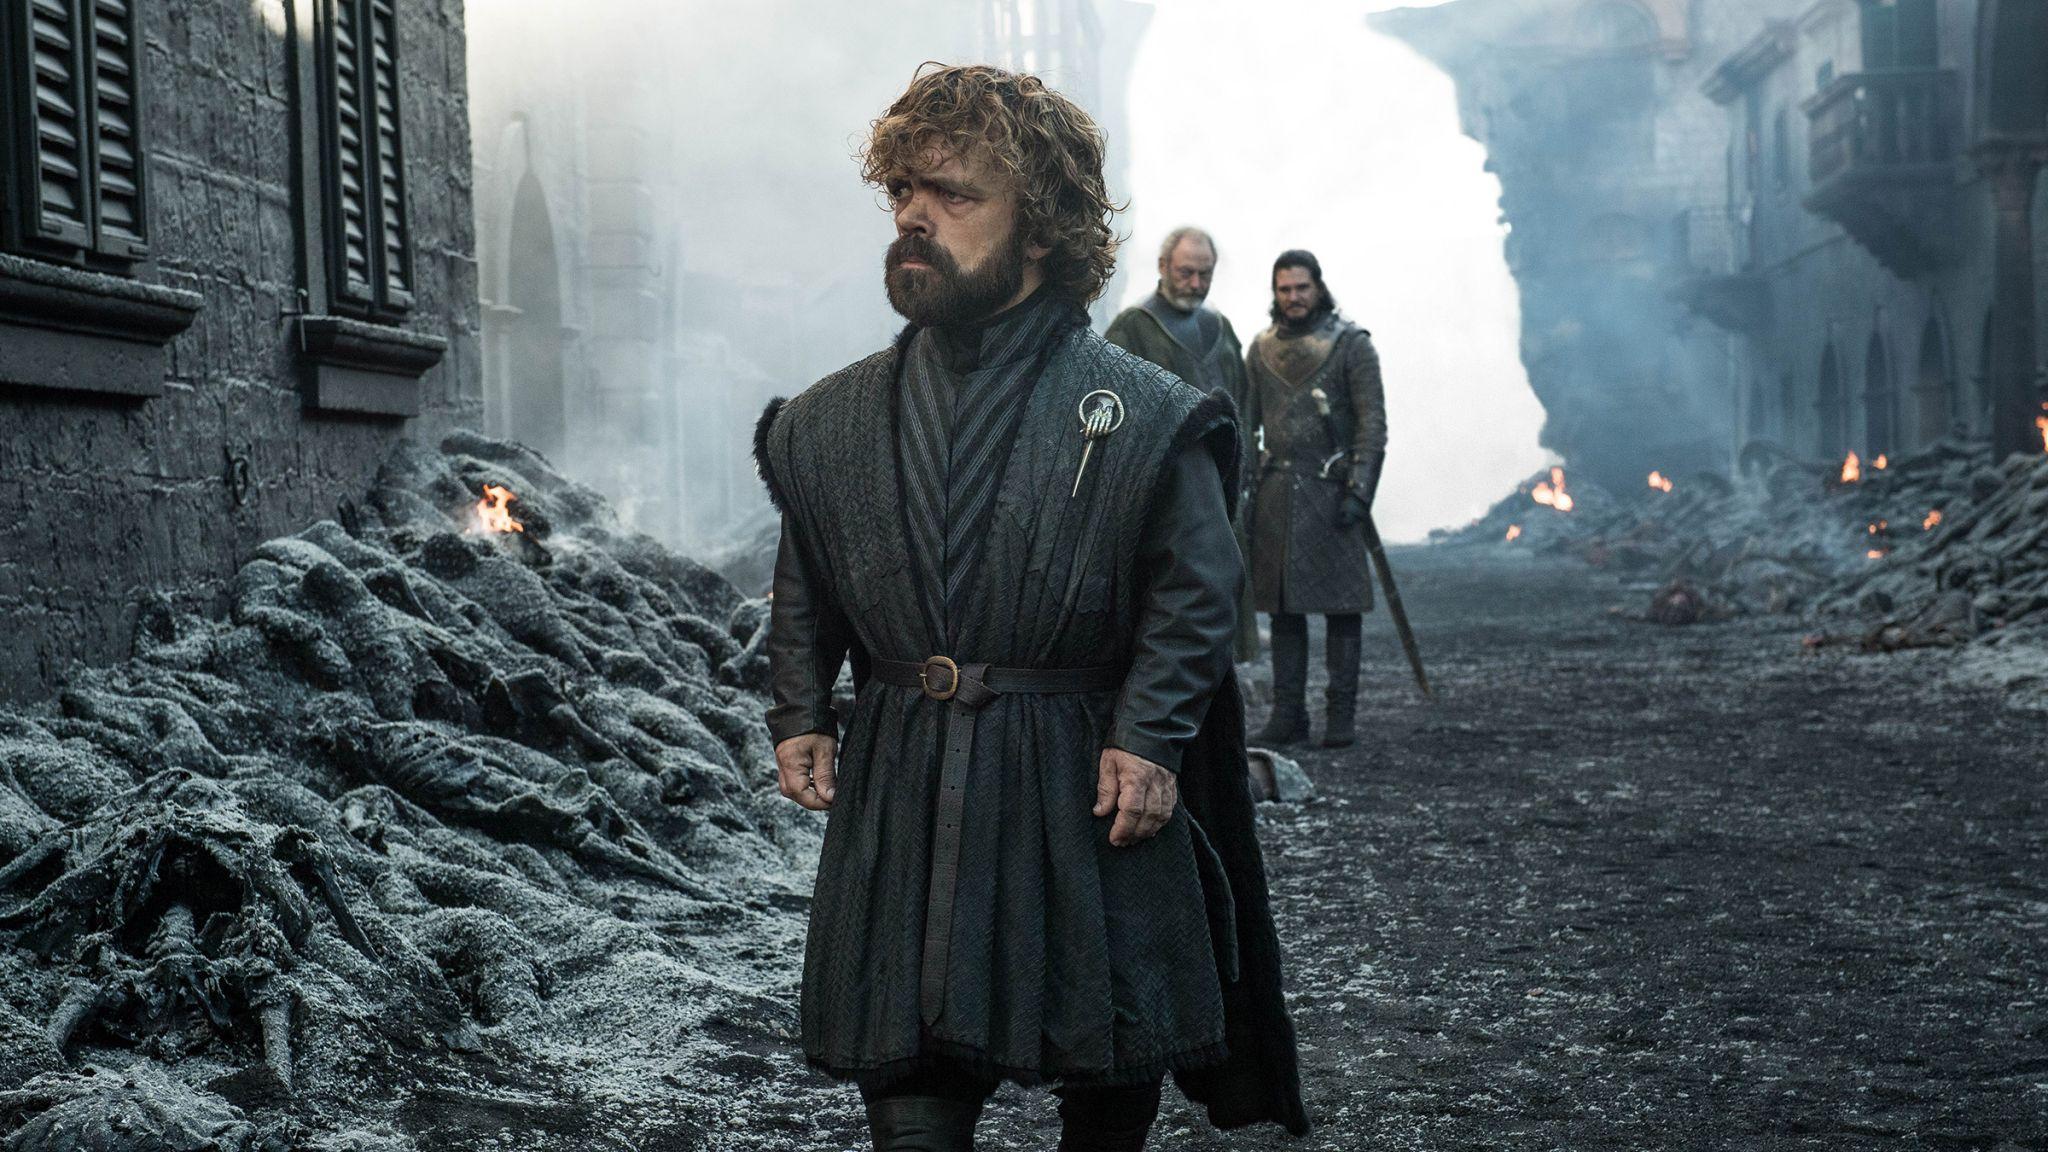 Tv Show Game Of Thrones Dragon Girl Daenerys Targaryen - Daenerys , HD Wallpaper & Backgrounds